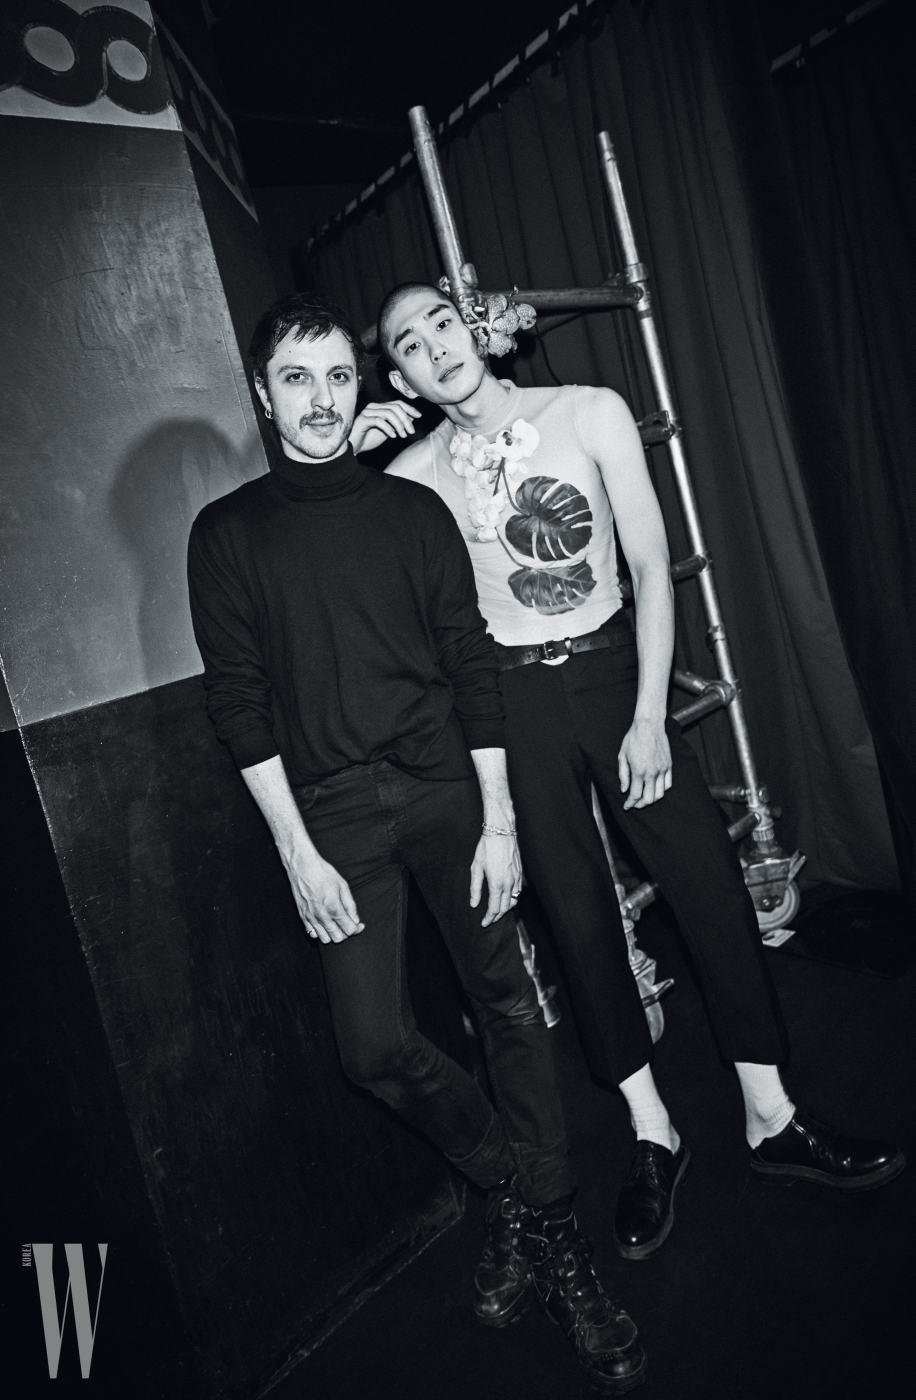 Y PROJECT 글렌 마르탱|디자이너 Photography by JANG DUK HWA 서하가 입고 있는 시스루 플라워 톱과 검은색 크롭트 팬츠와 벨트는 모두 Y Project 제품.